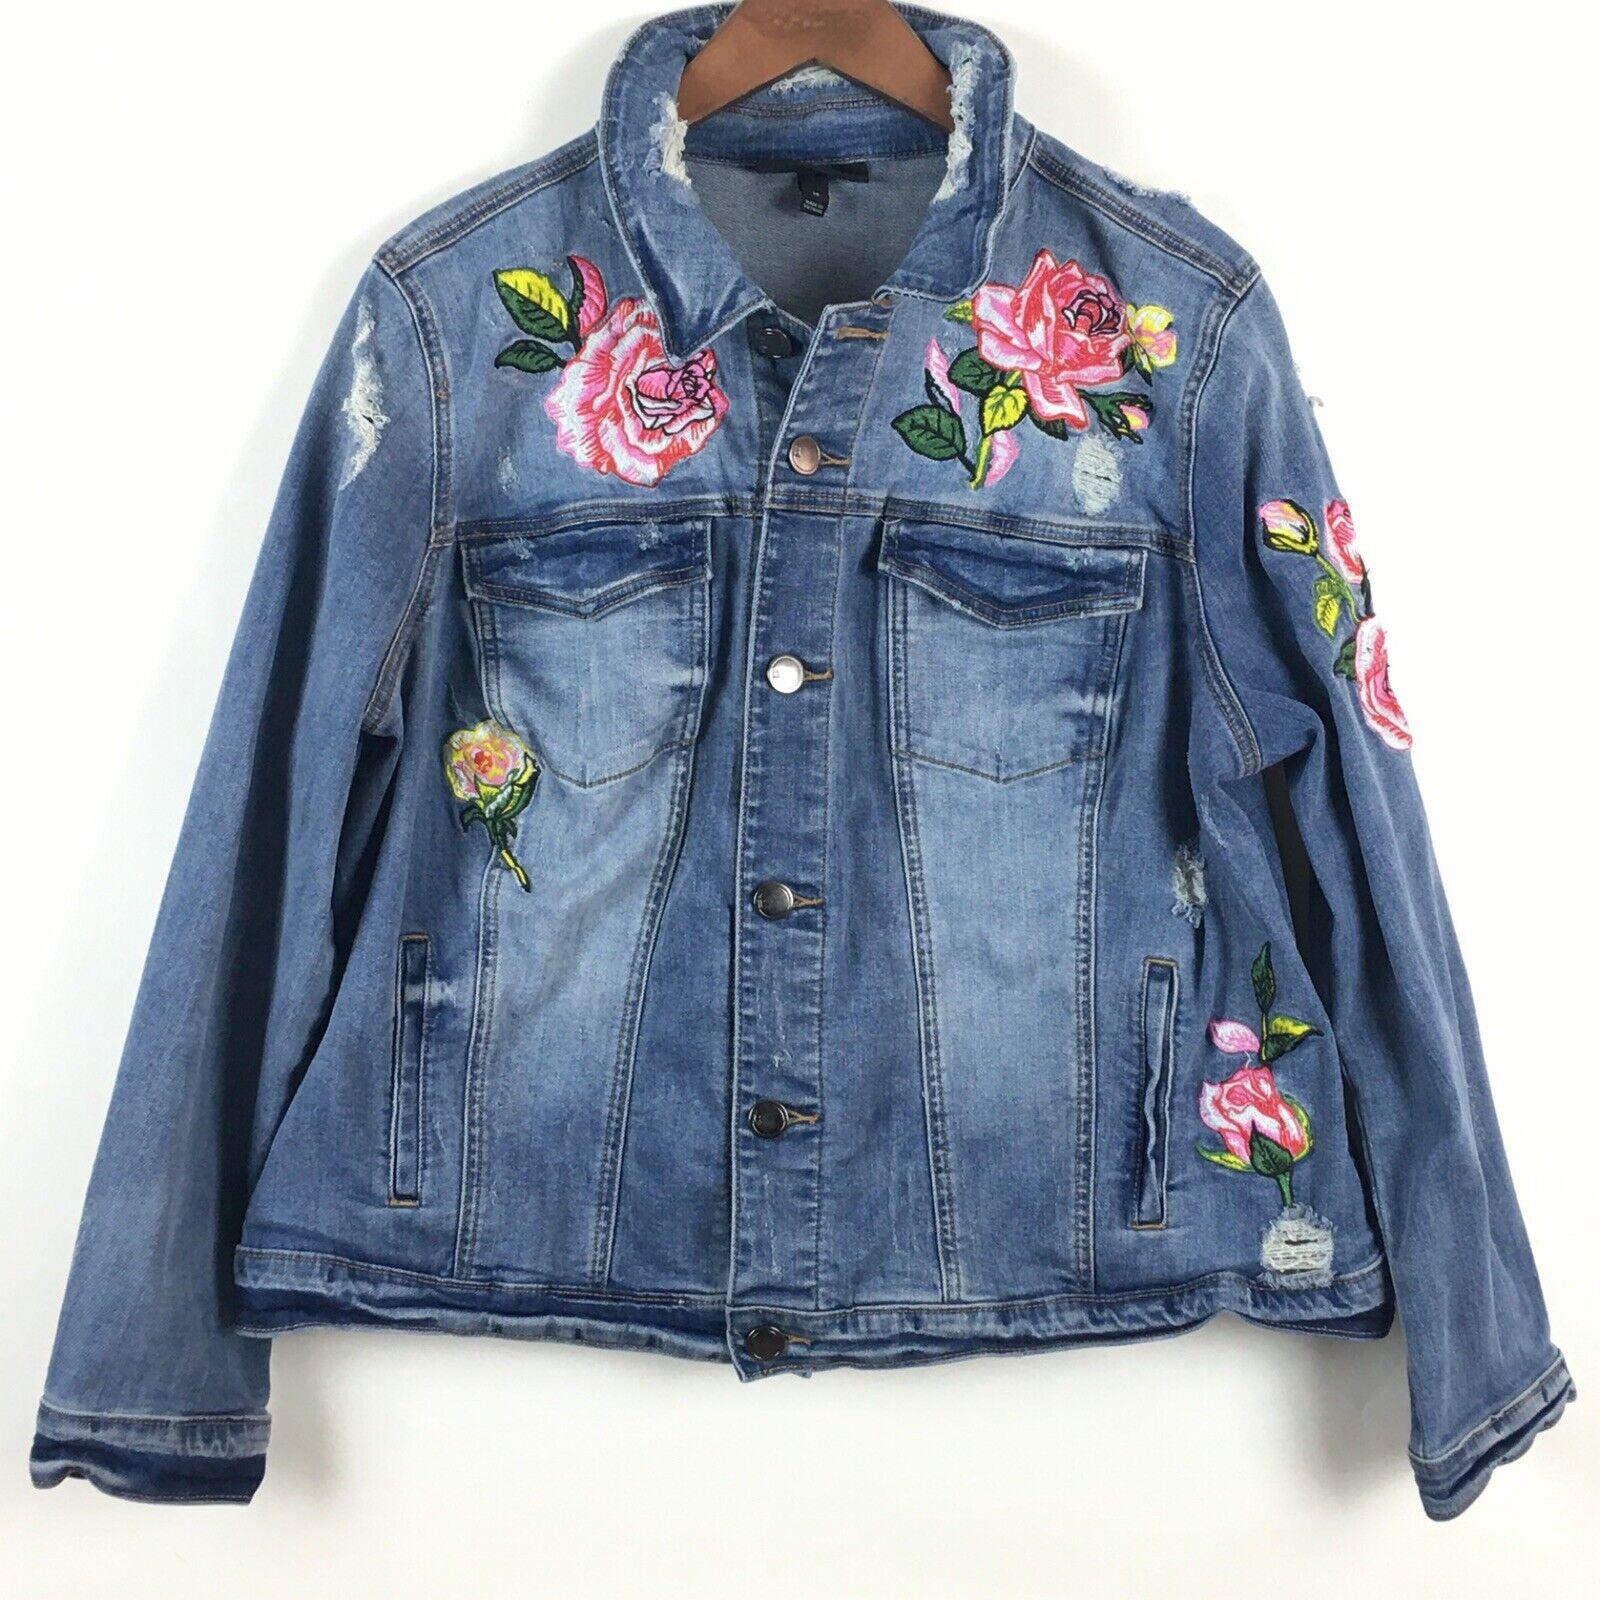 Lane Bryant Denim Jacket 18 Embroidered Floral Rose Distressed Button Up Stretch